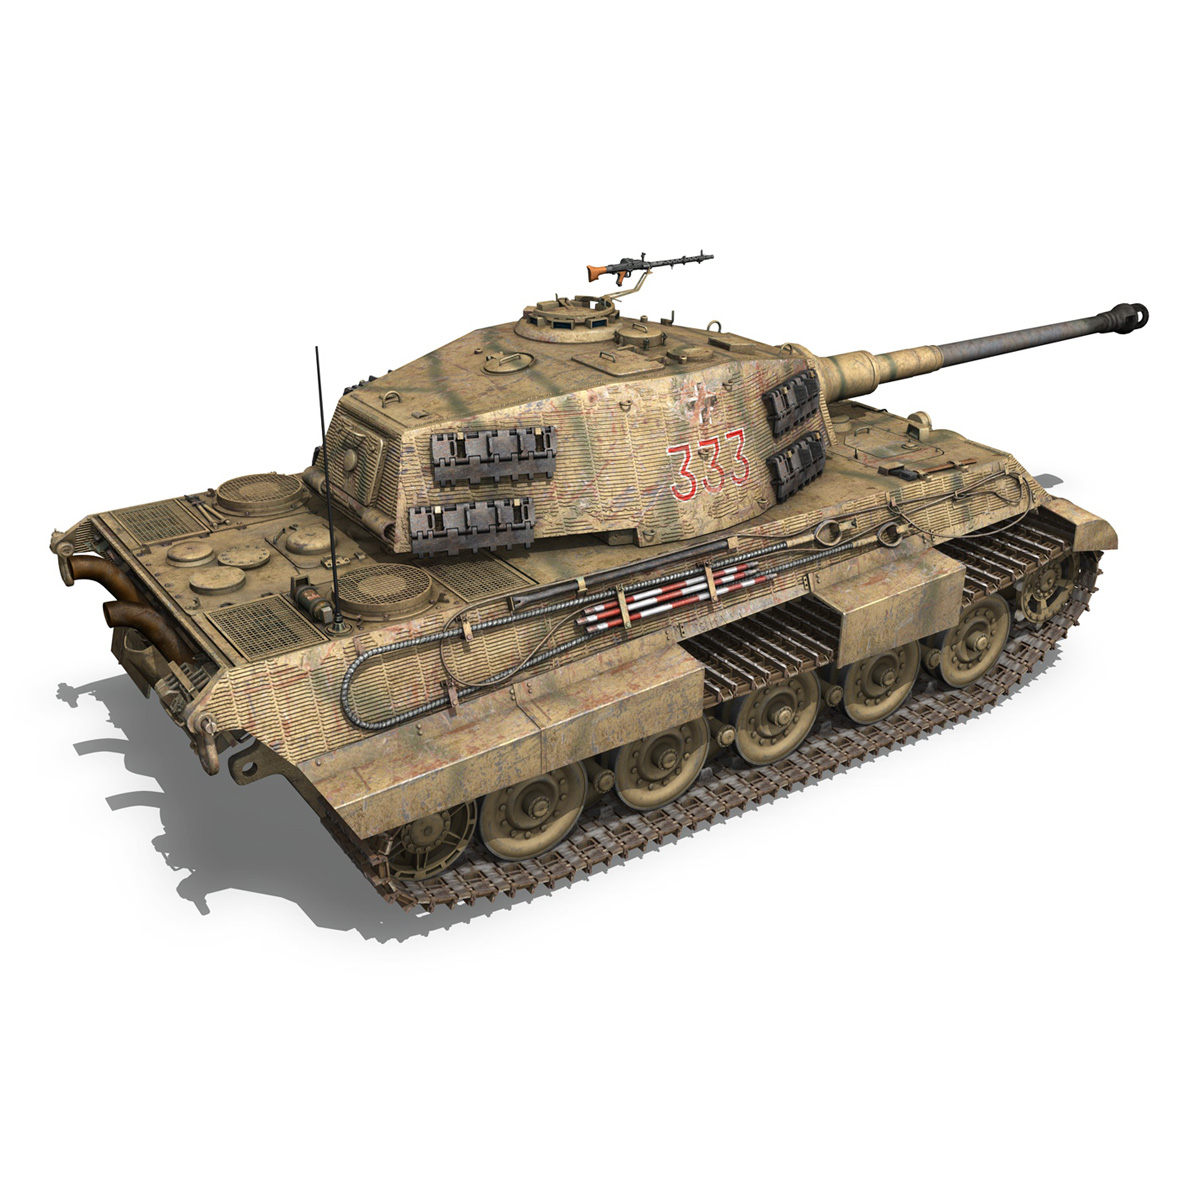 panzerkampfwagen vi – ausf.b – tiger ii – 333 3d model 3ds lwo lw lws obj c4d 265605